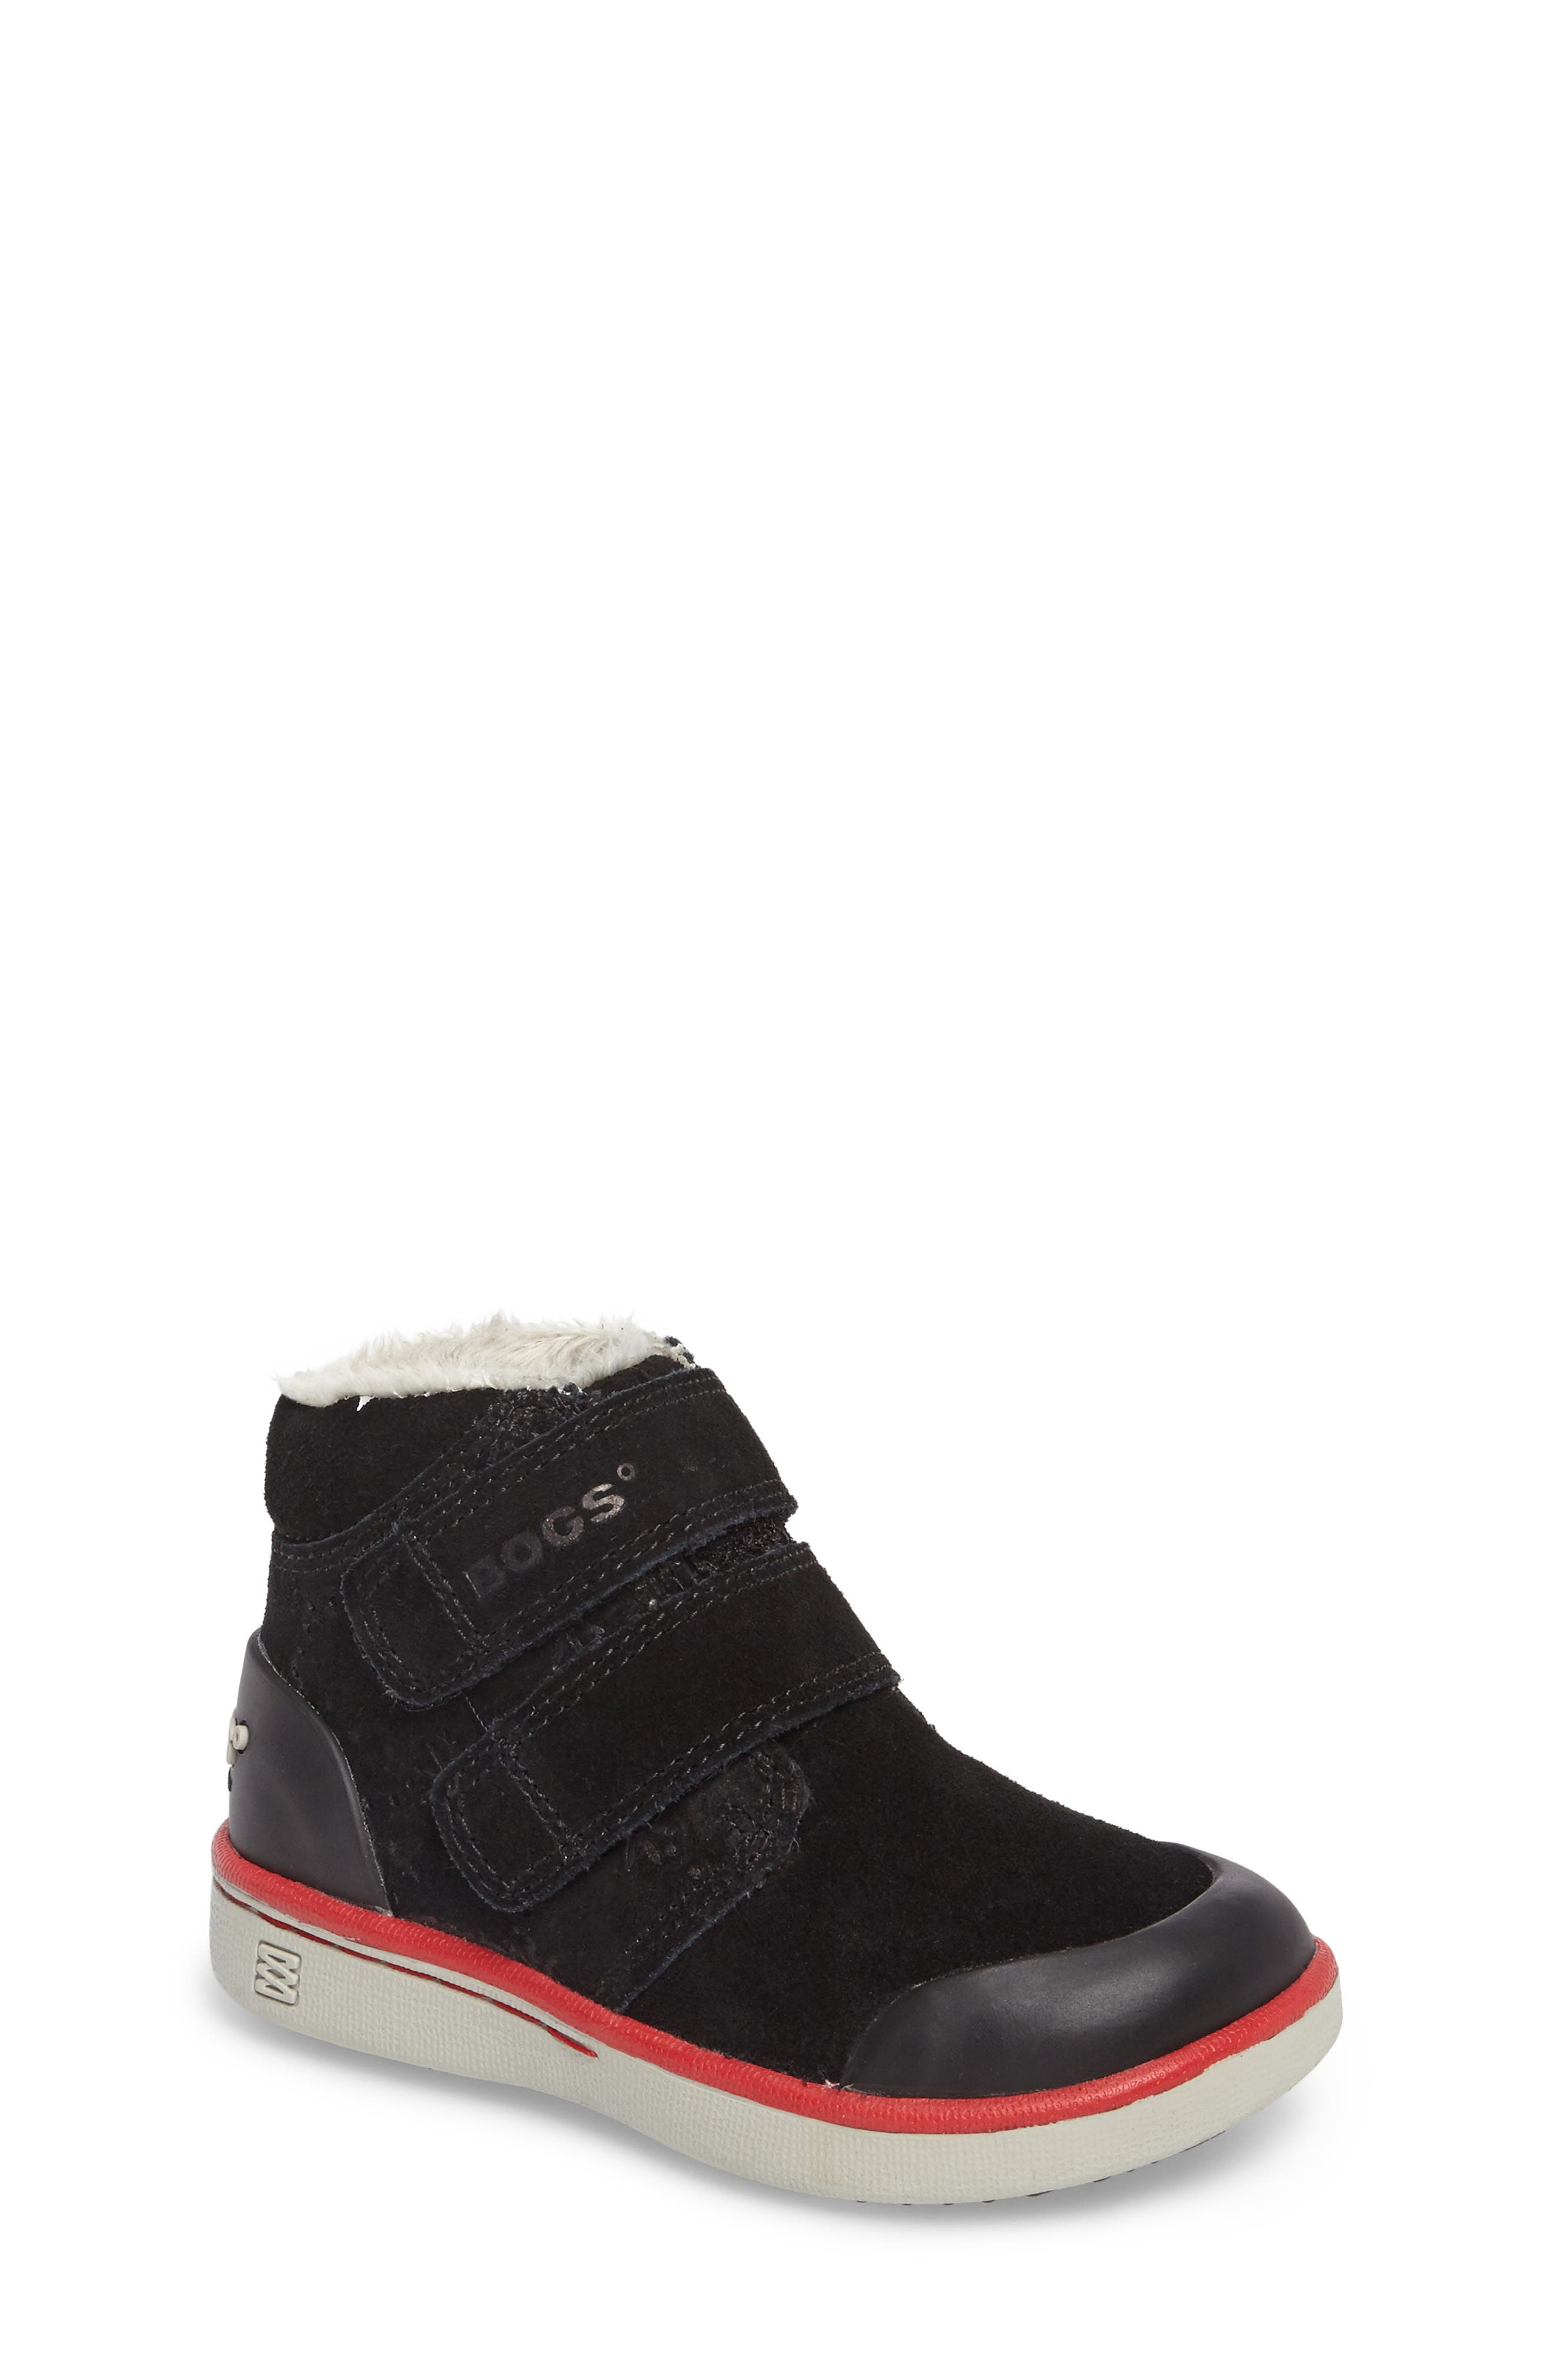 Samantha Faux Fur Waterproof Boot,                             Main thumbnail 1, color,                             Black/ Black